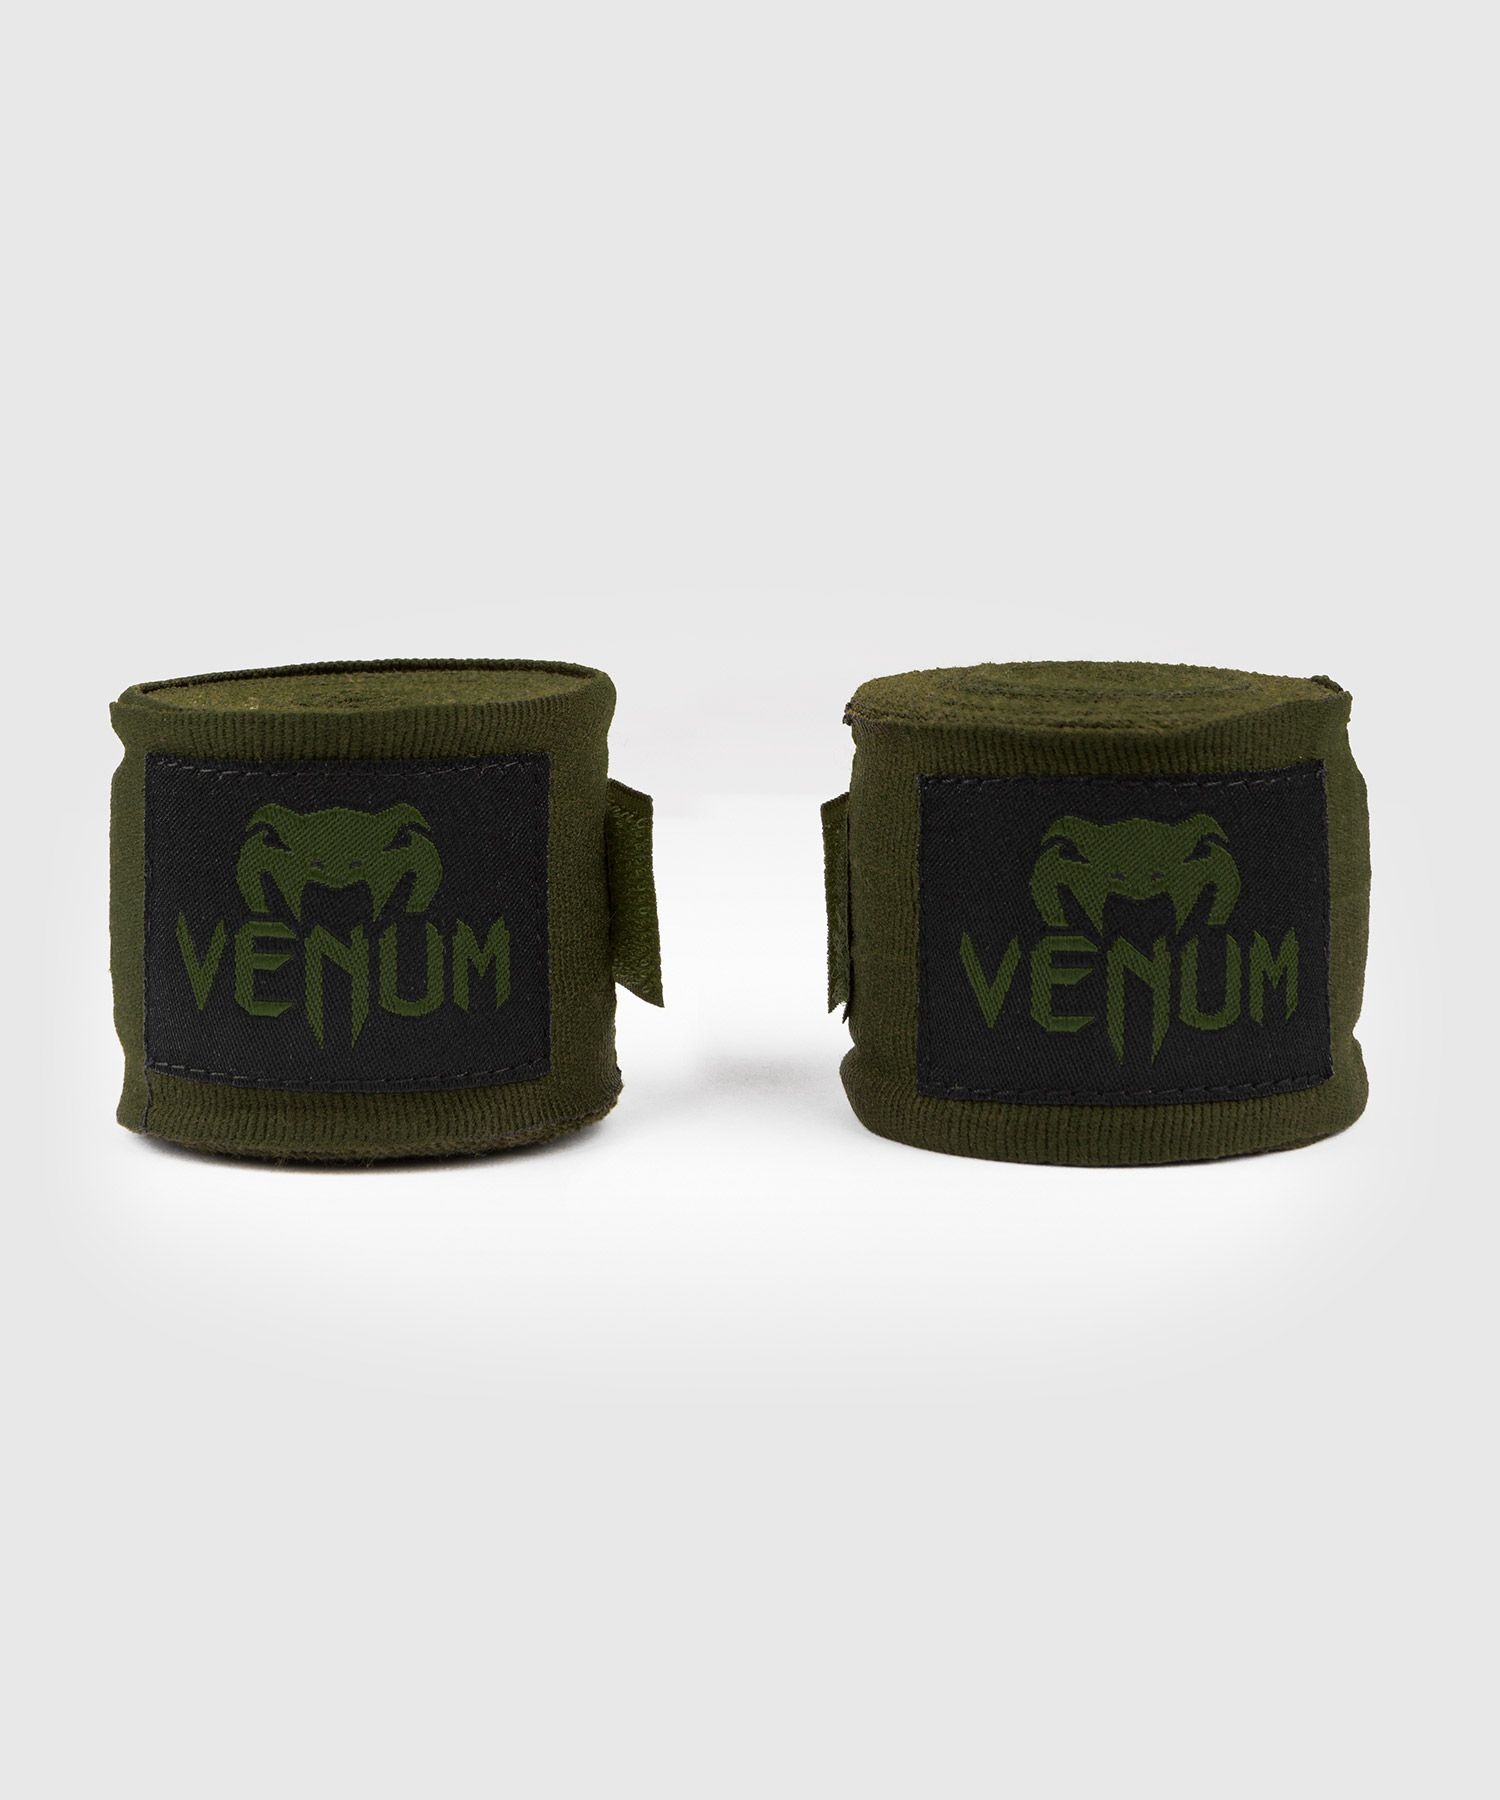 Fasce da boxe Venum Kontact - 4 m - Cachi/Nero